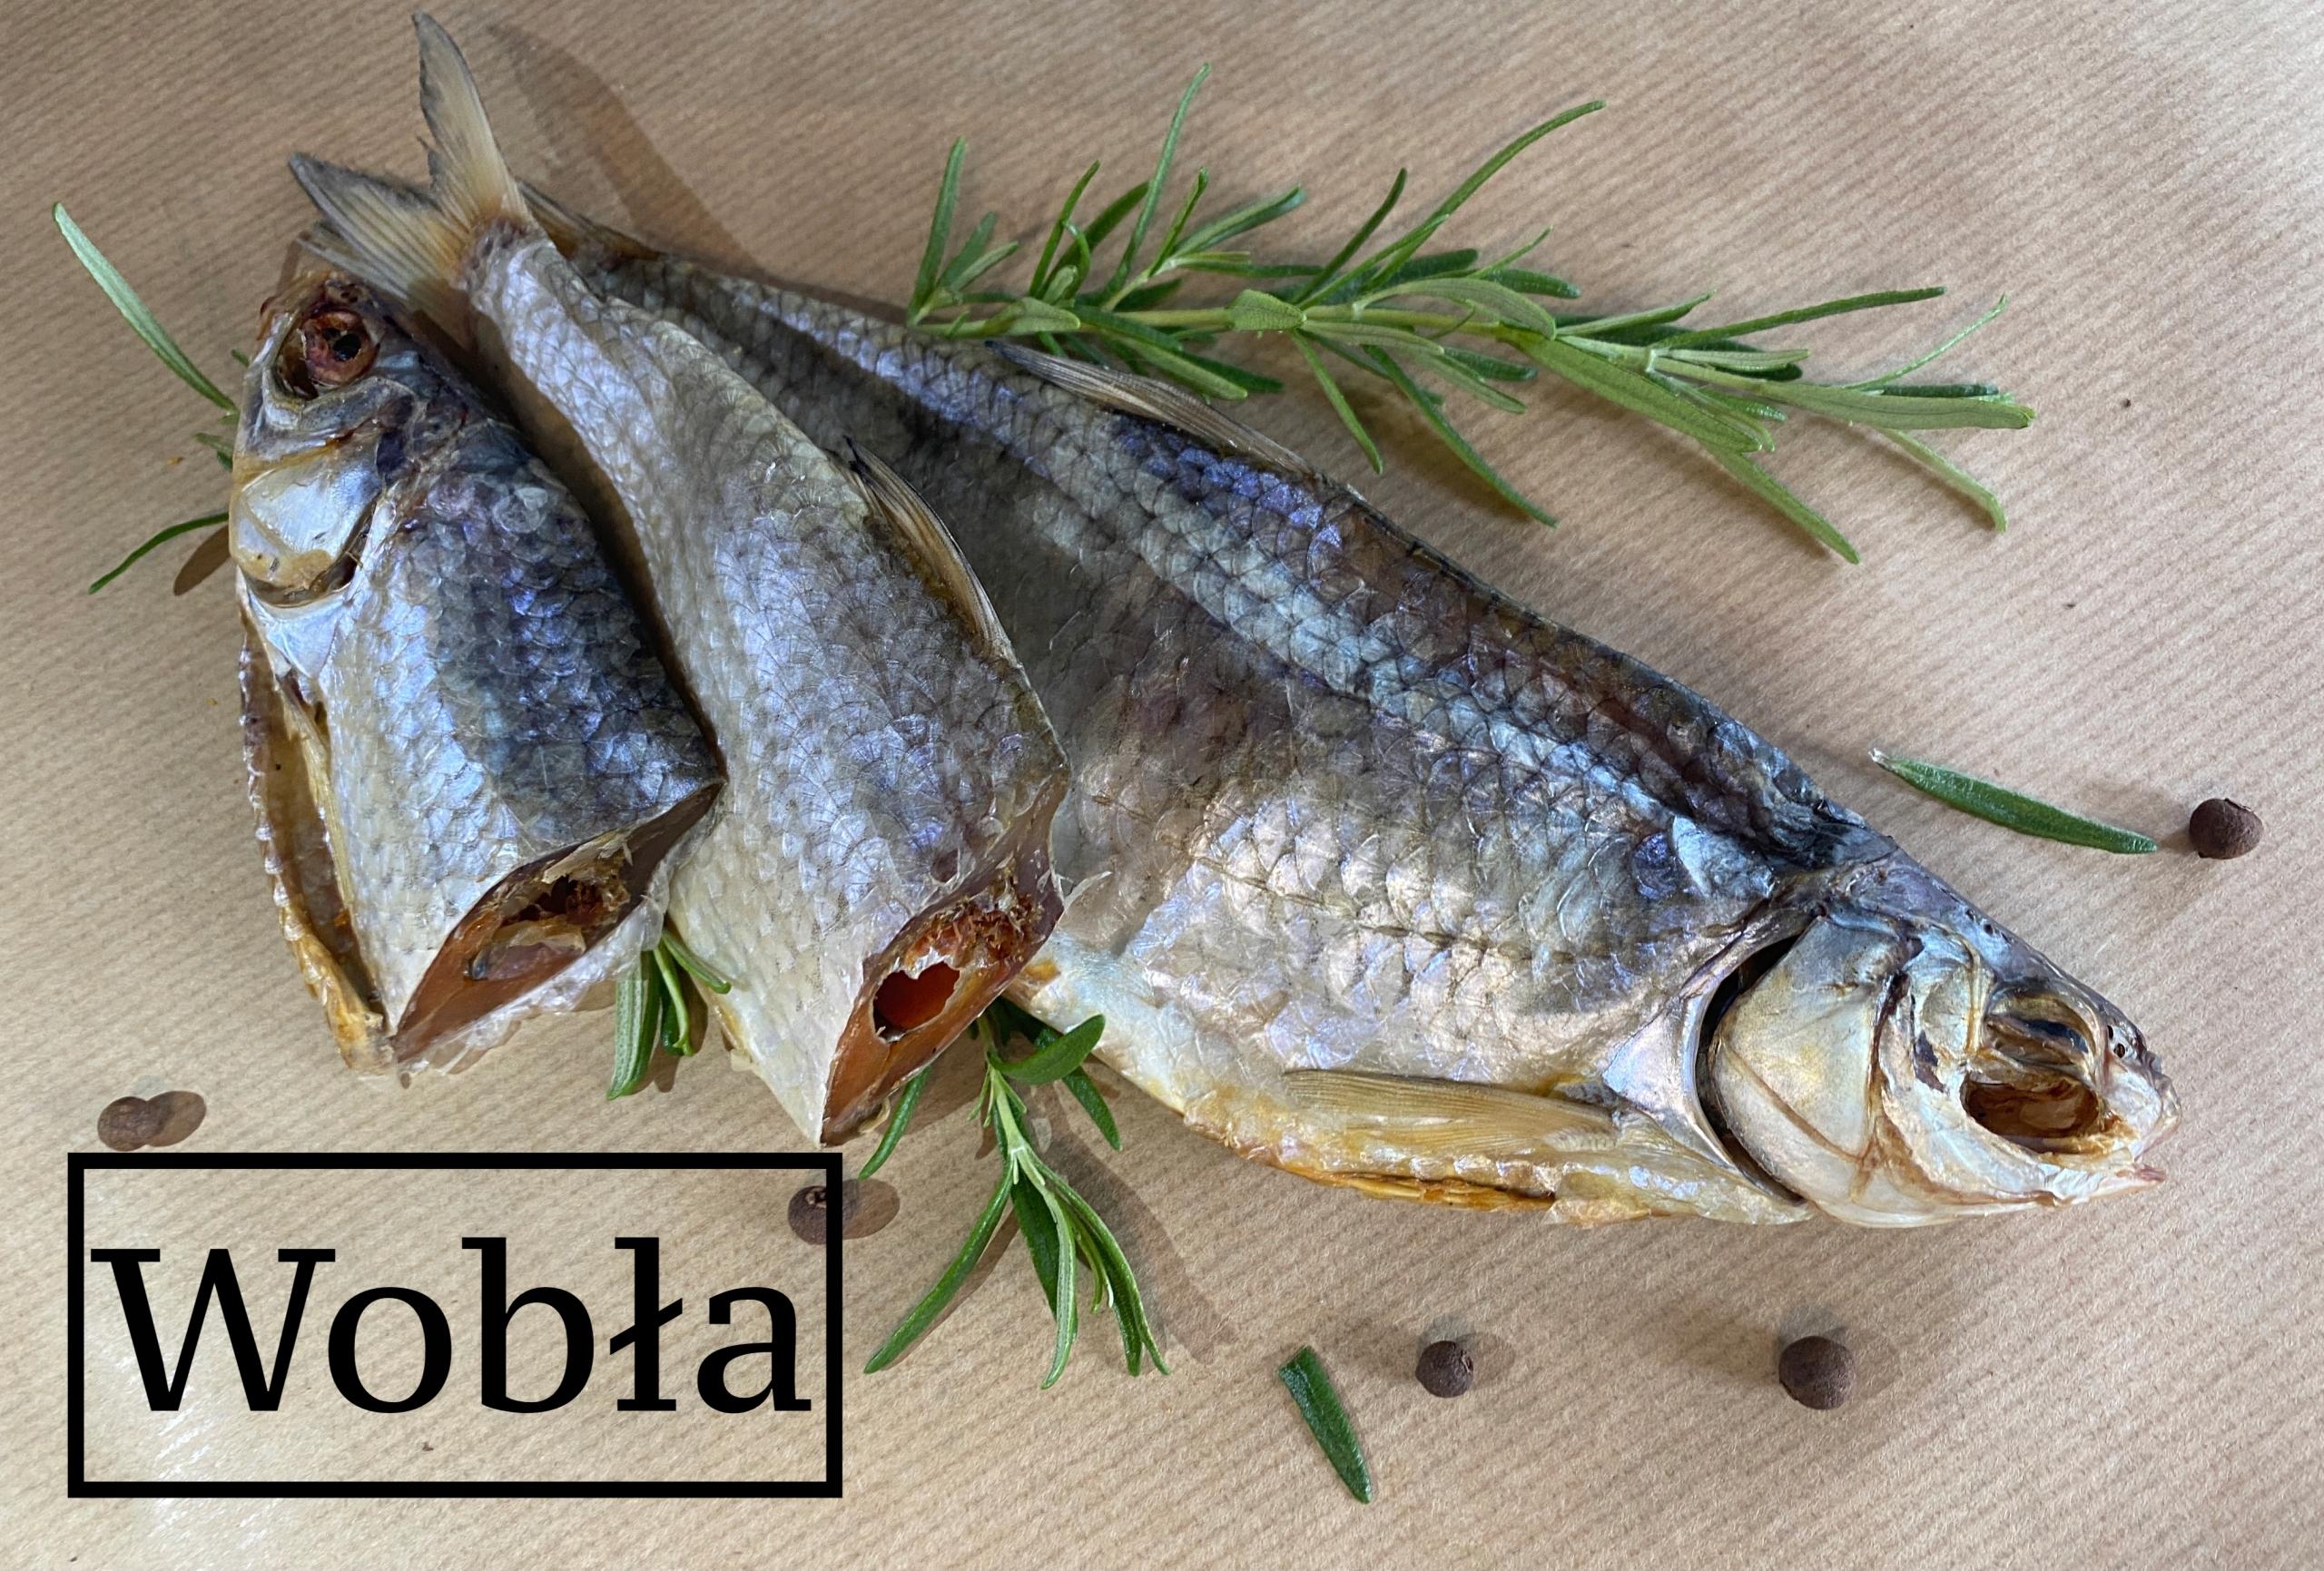 Вобла (каспийская плотва) Сушеная рыба 500 +/- 10г